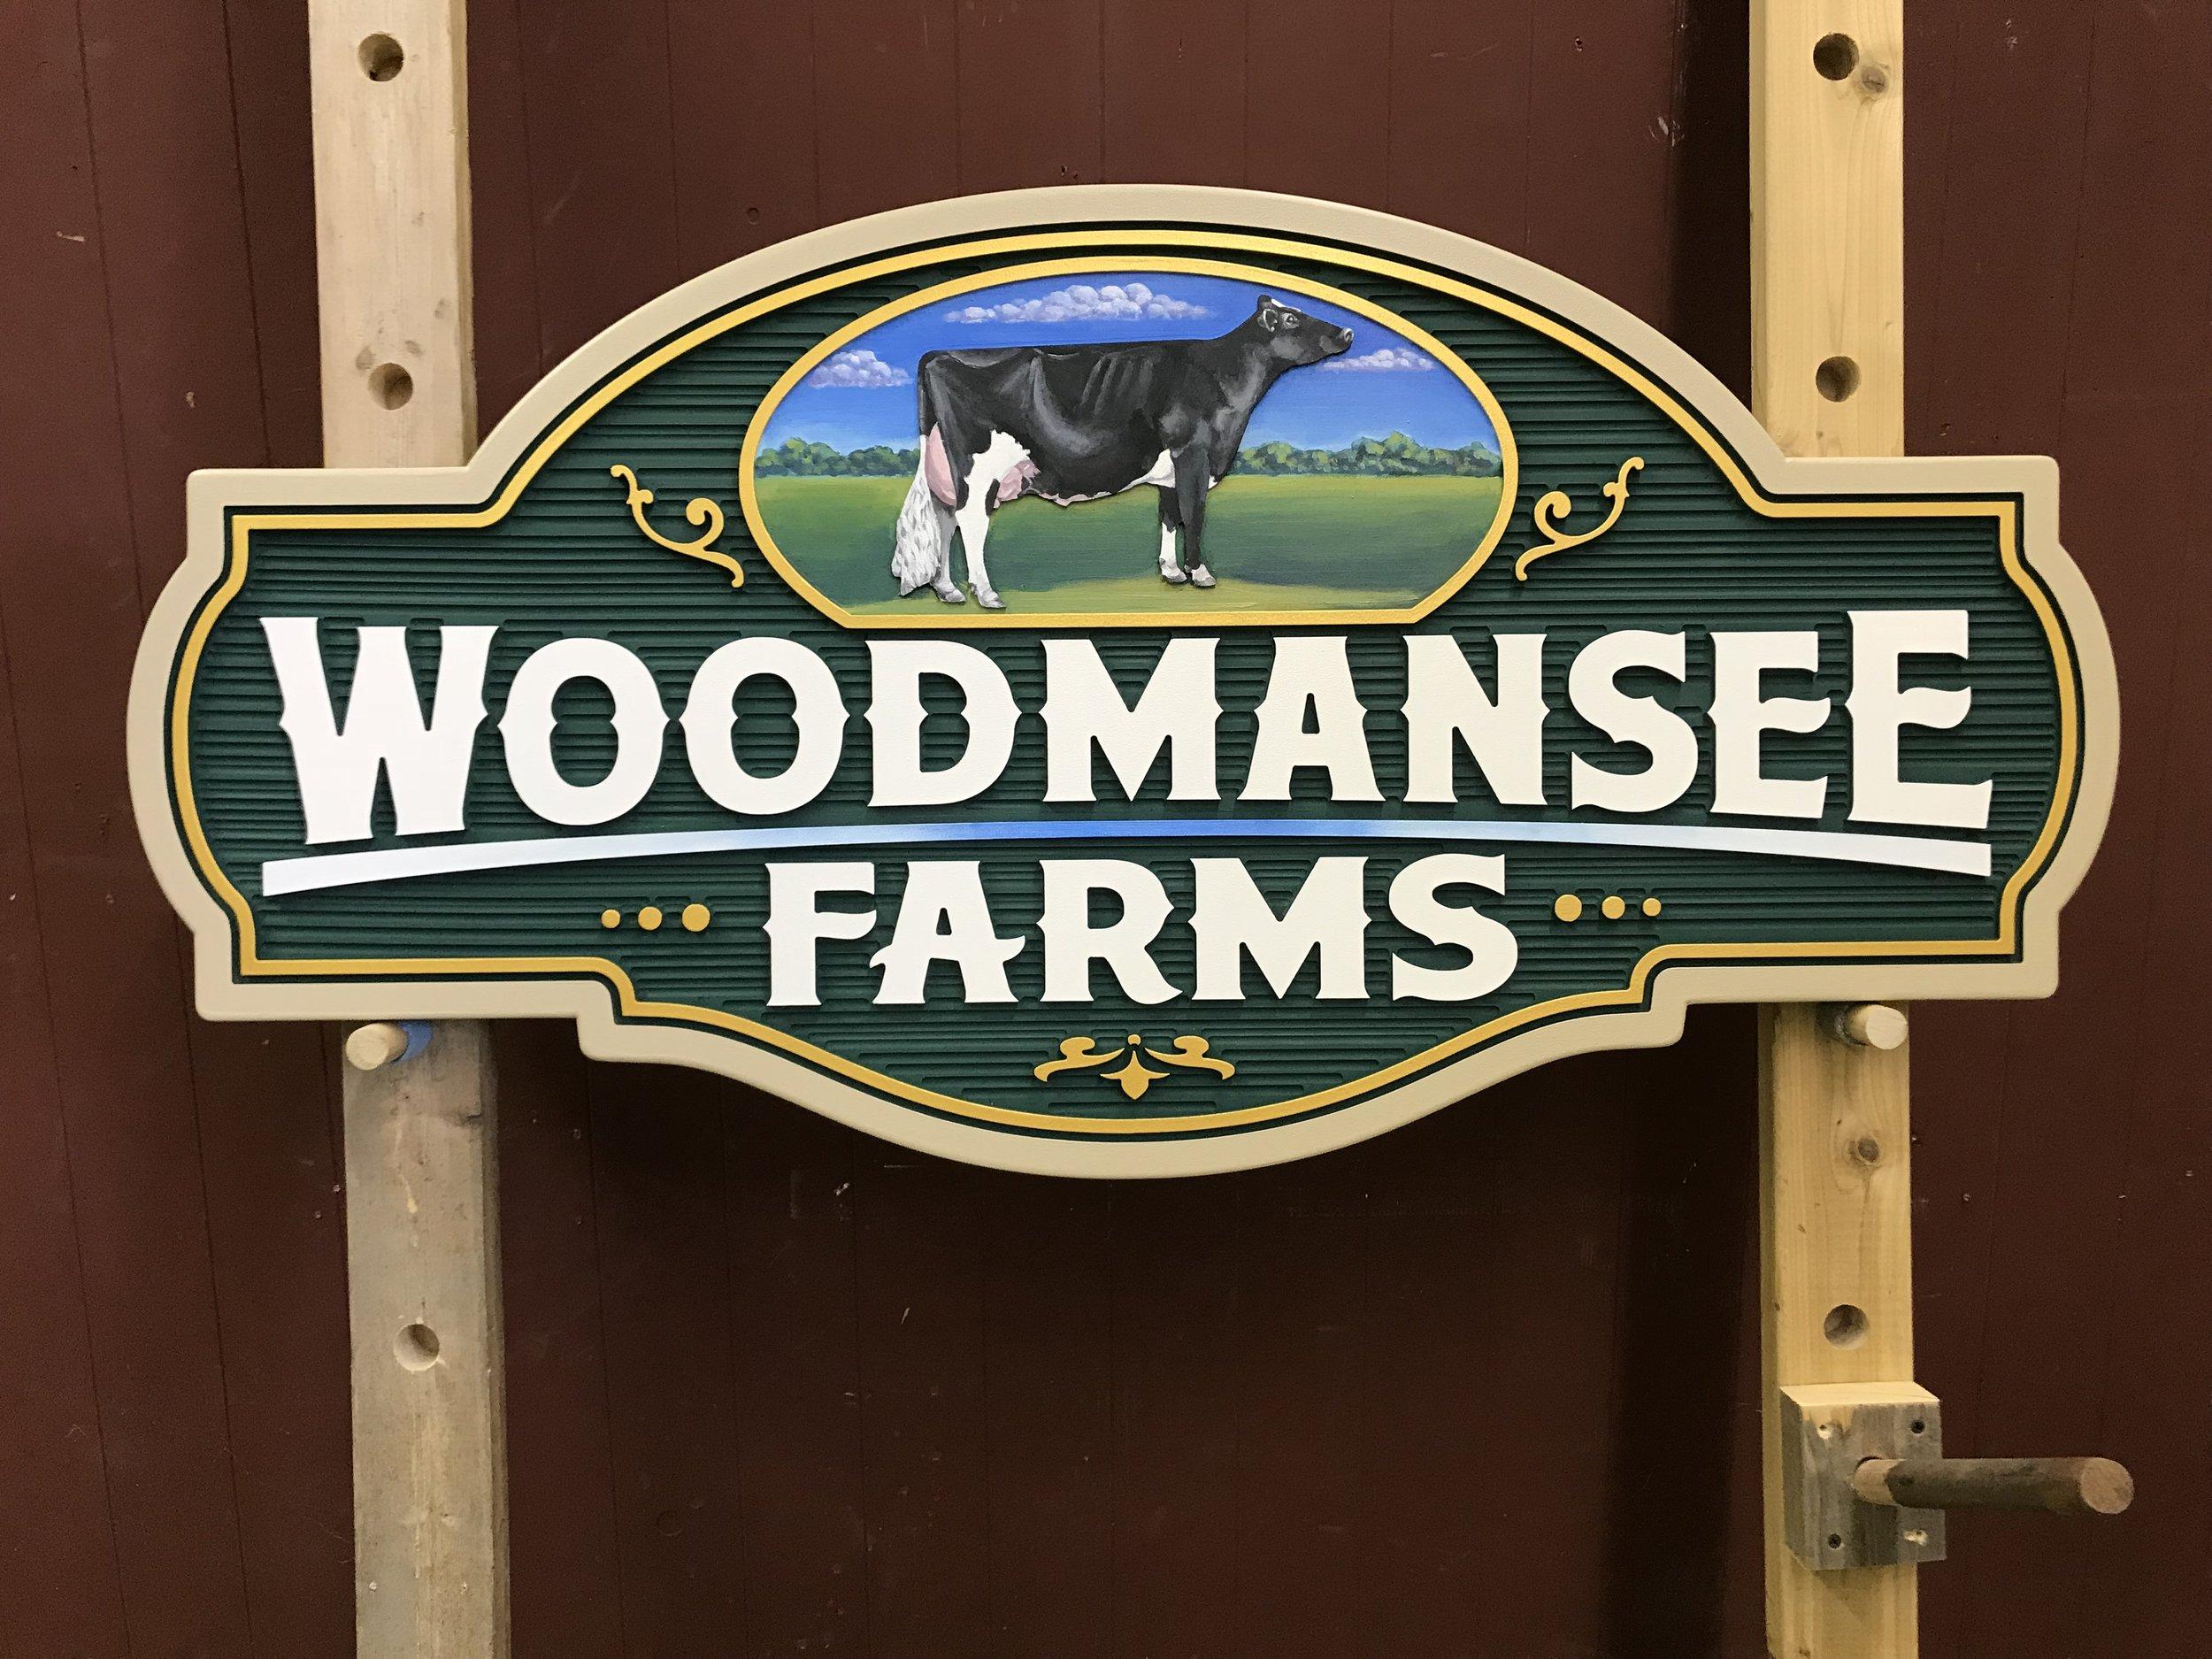 FarmWoodmansee.jpg